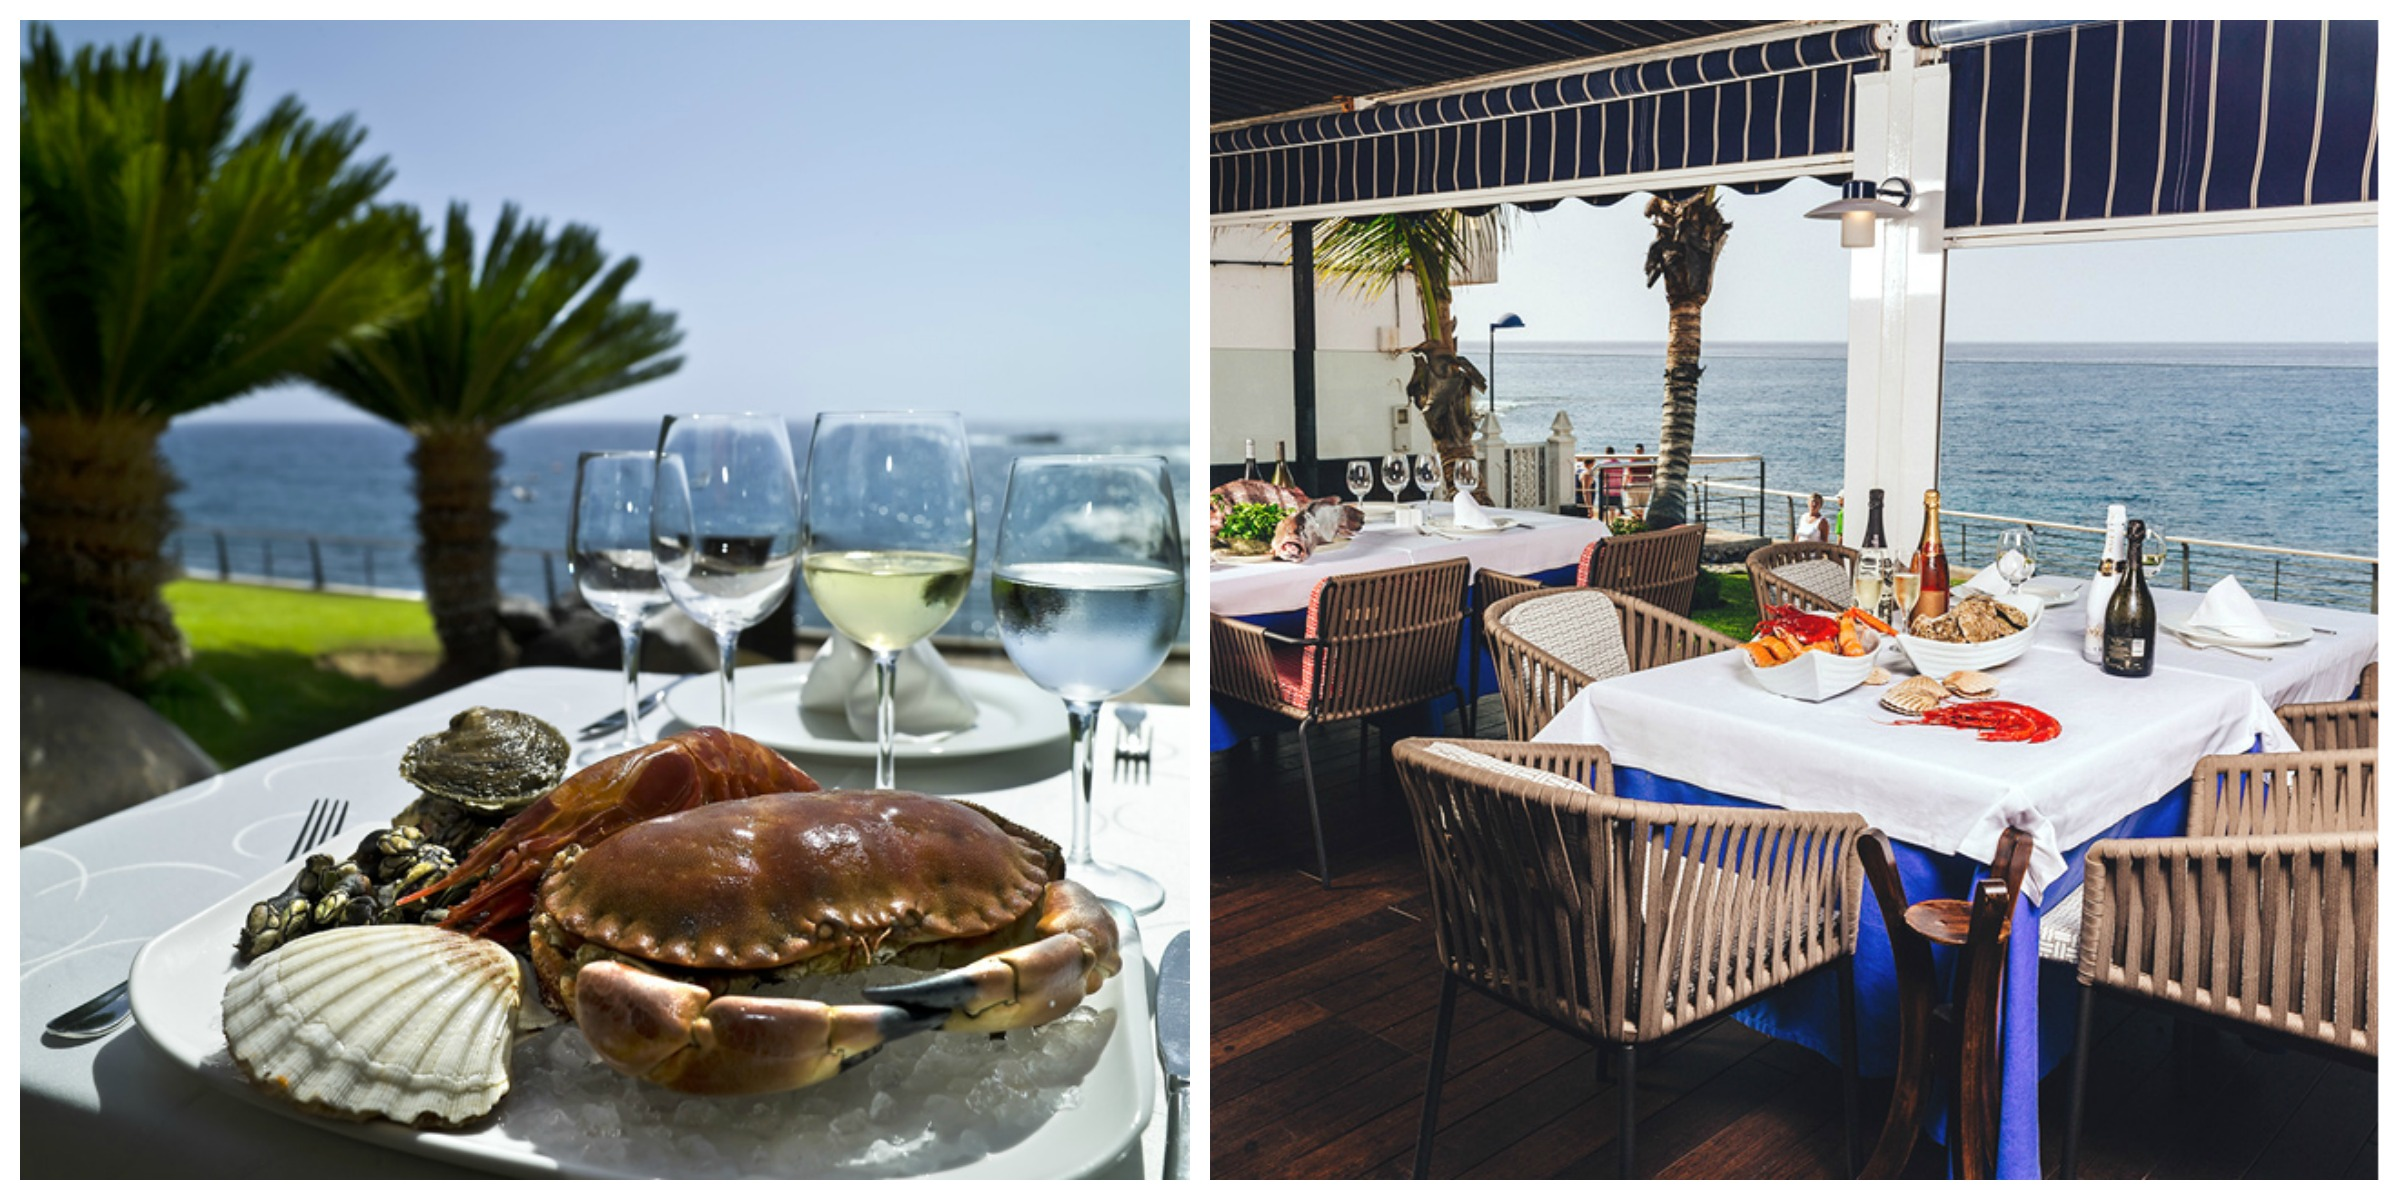 Best Restaurants In La Caleta Tenerife